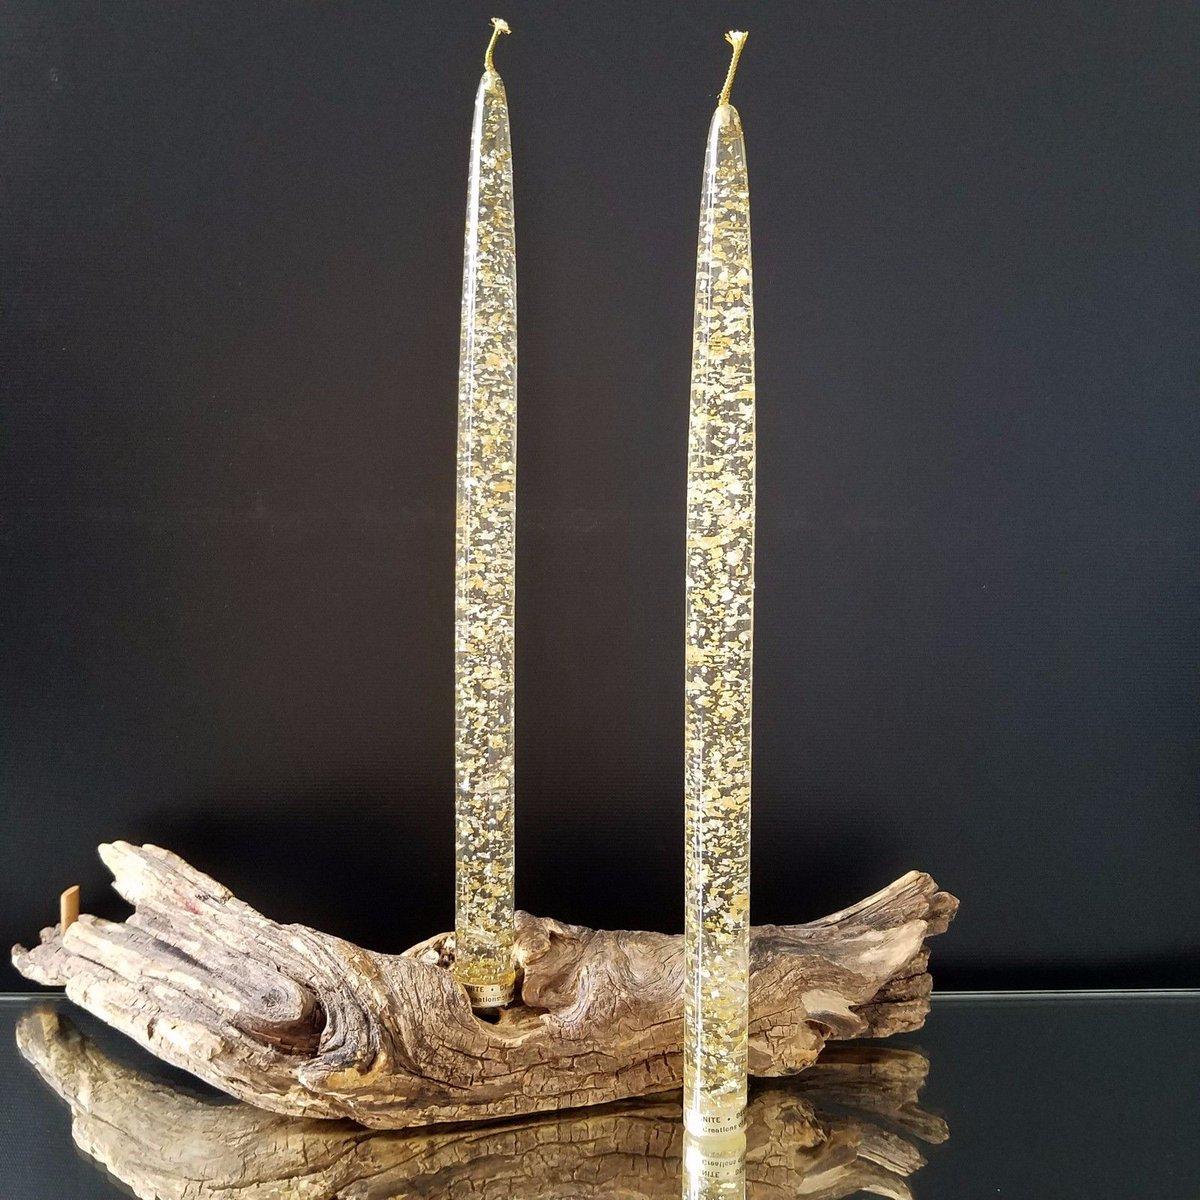 #Vintage Acrylic Gold Flecked #Candlesticks #homecoming #home  http://www. ebay.com/itm/1424242833 92?ssPageName=STRK:MESELX:IT&amp;_trksid=p3984.m1555.l2649 &nbsp; … <br>http://pic.twitter.com/cu8gyWfzUg